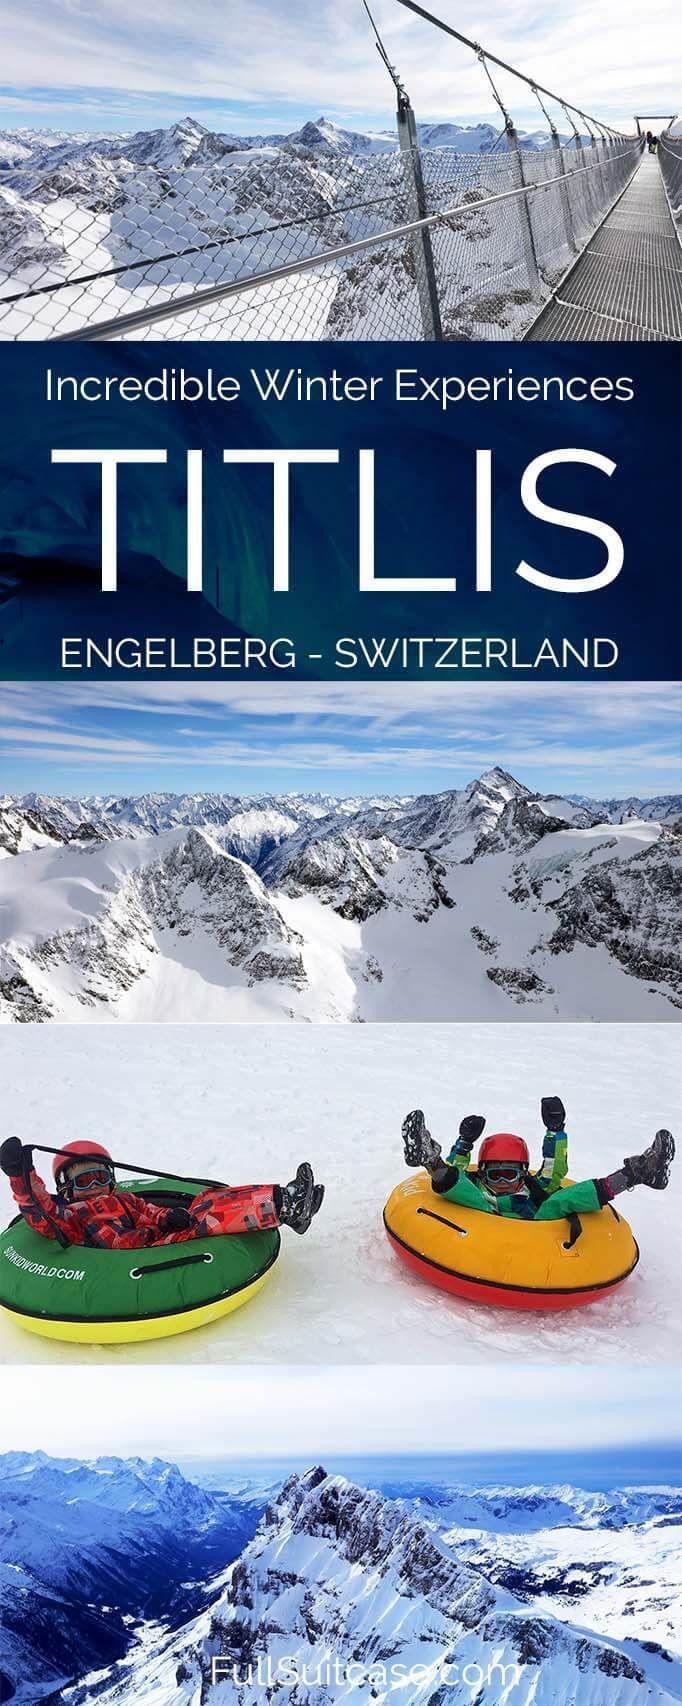 Incredible winter experiences on Mount Titlis in Engelberg, Switzerland